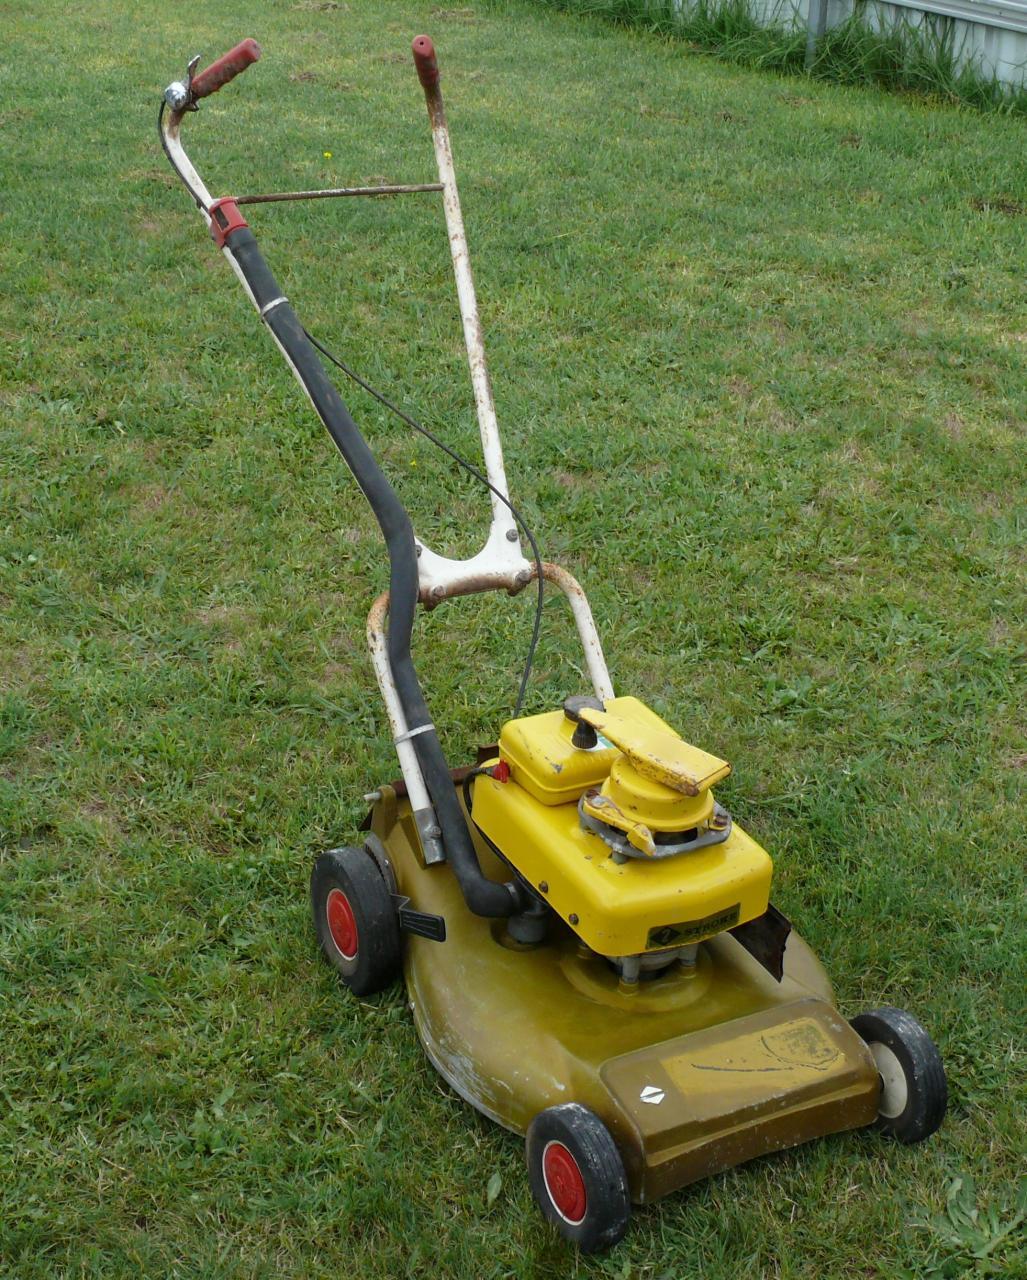 victa mayfair help identifying my new mower outdoorking repair forum rh outdoorking com